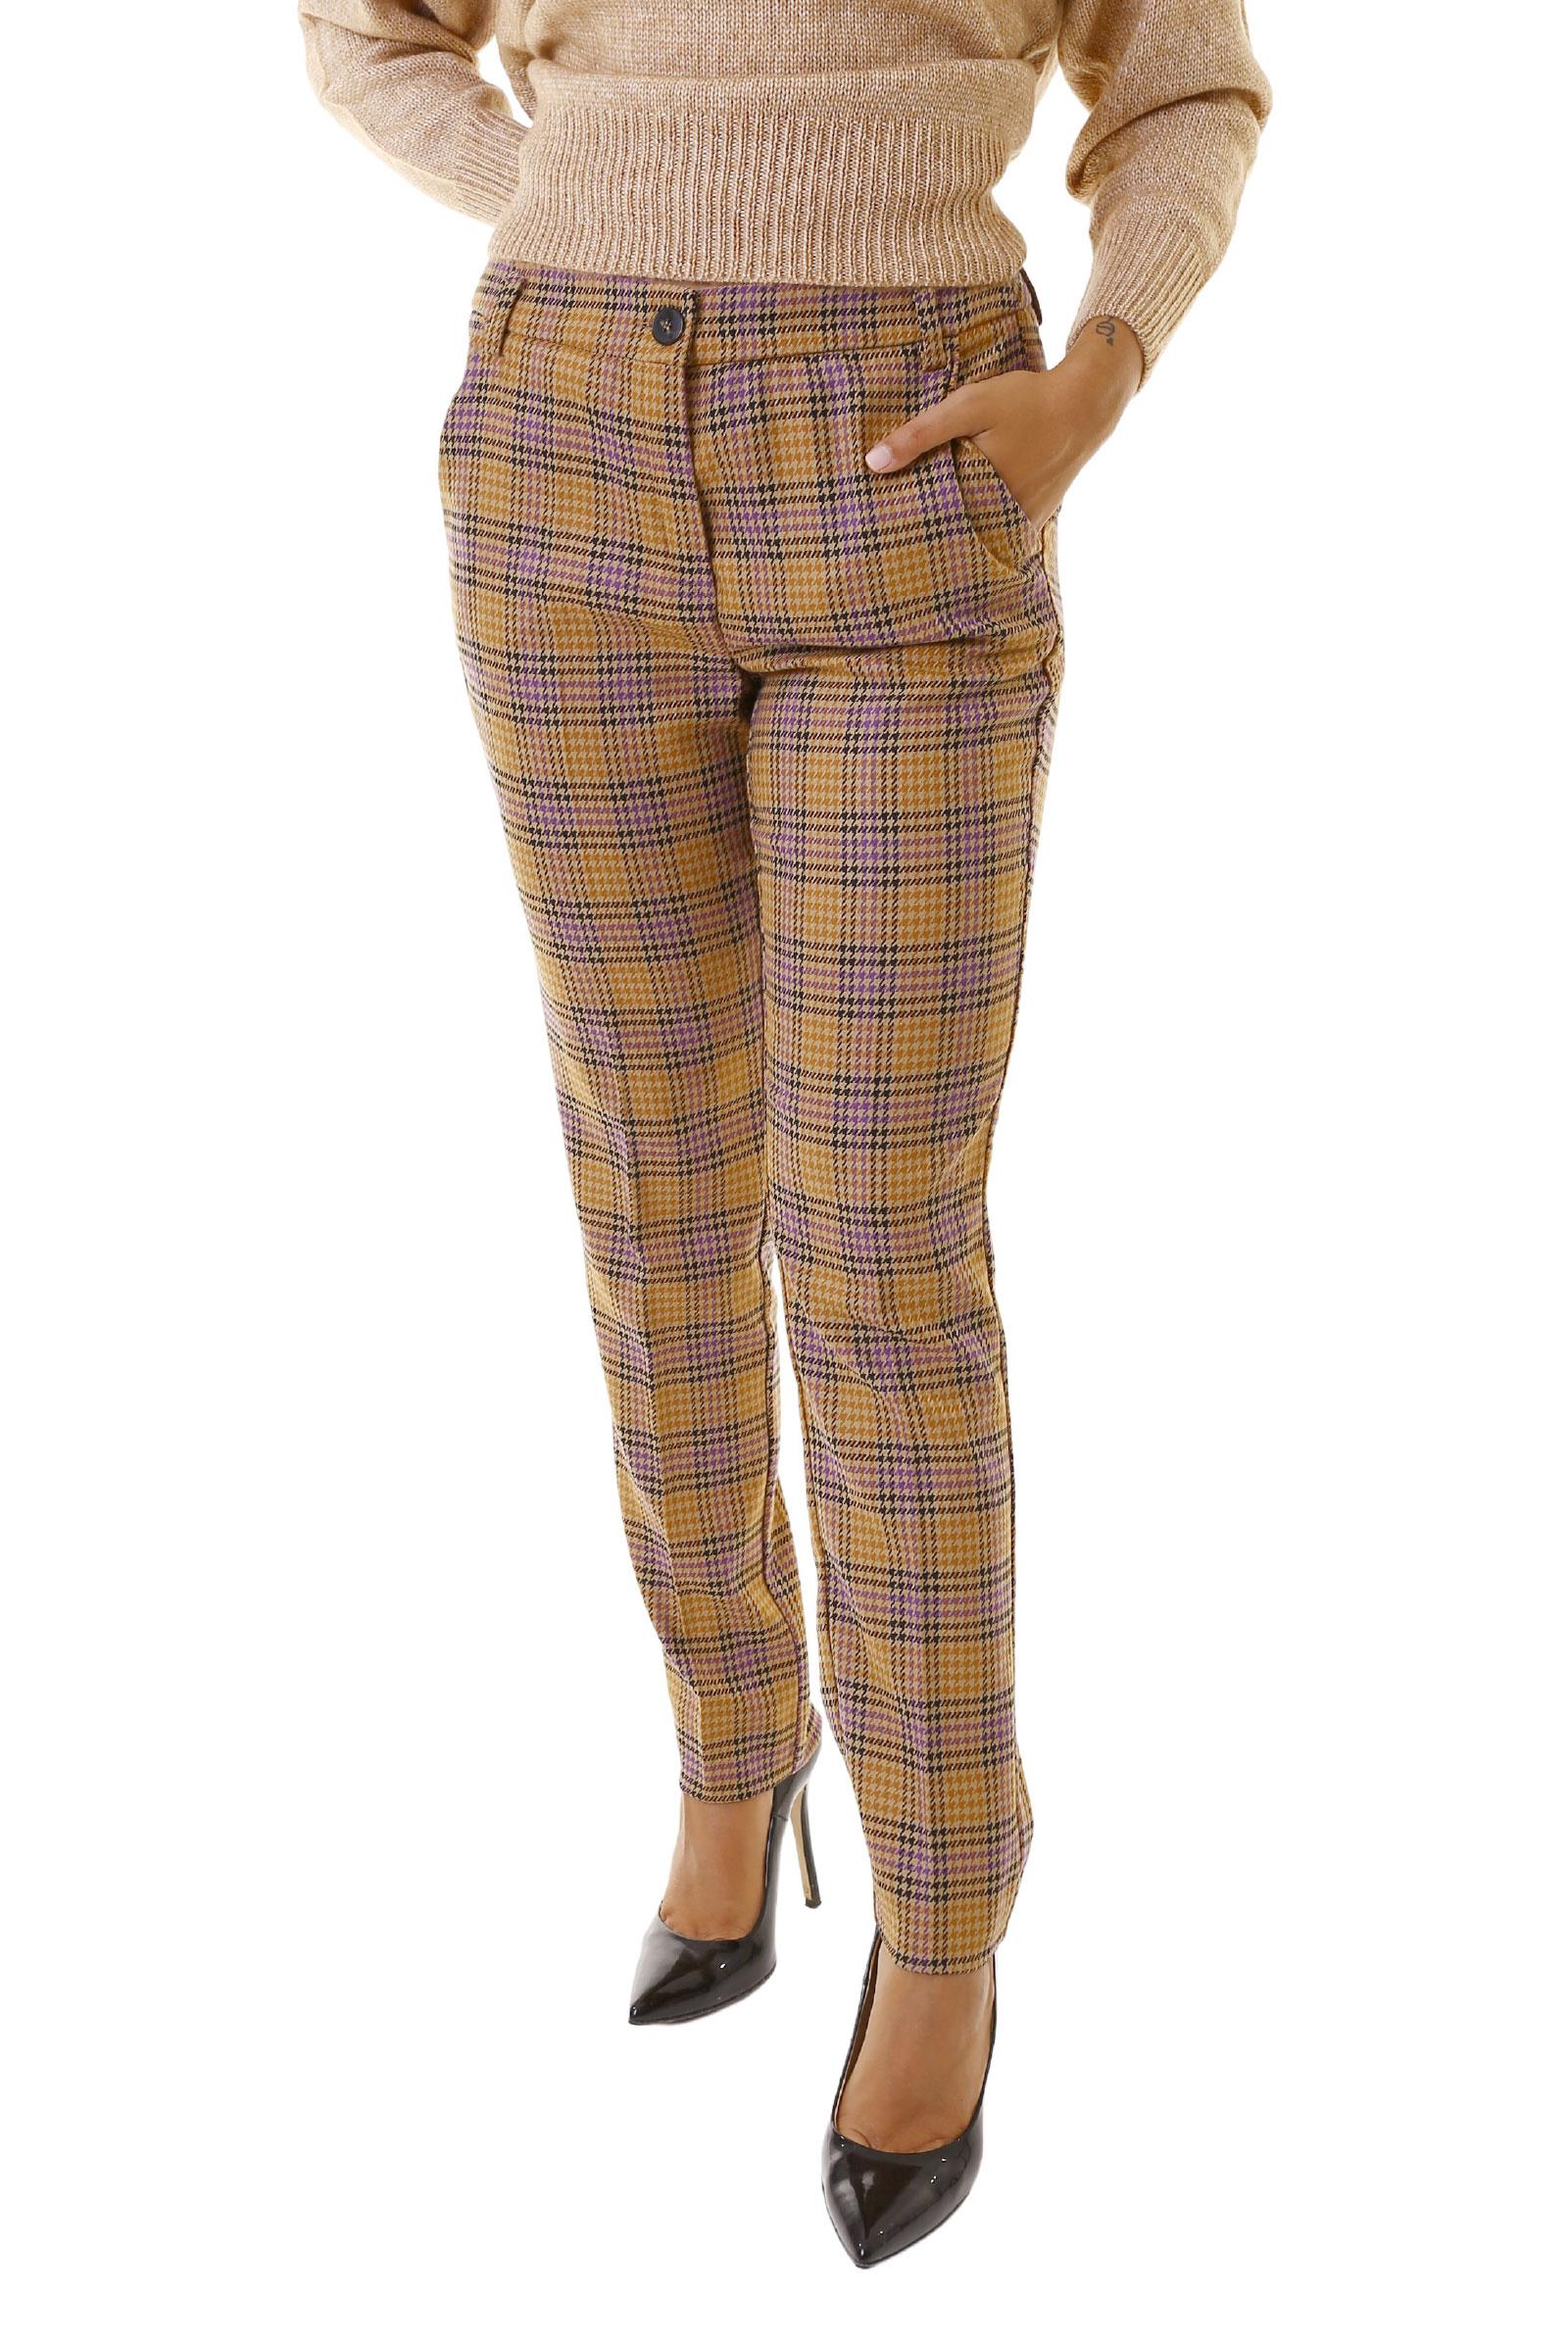 Pantalone Donna Modello INDU EMME MARELLA | Pantalone | 51360618200001